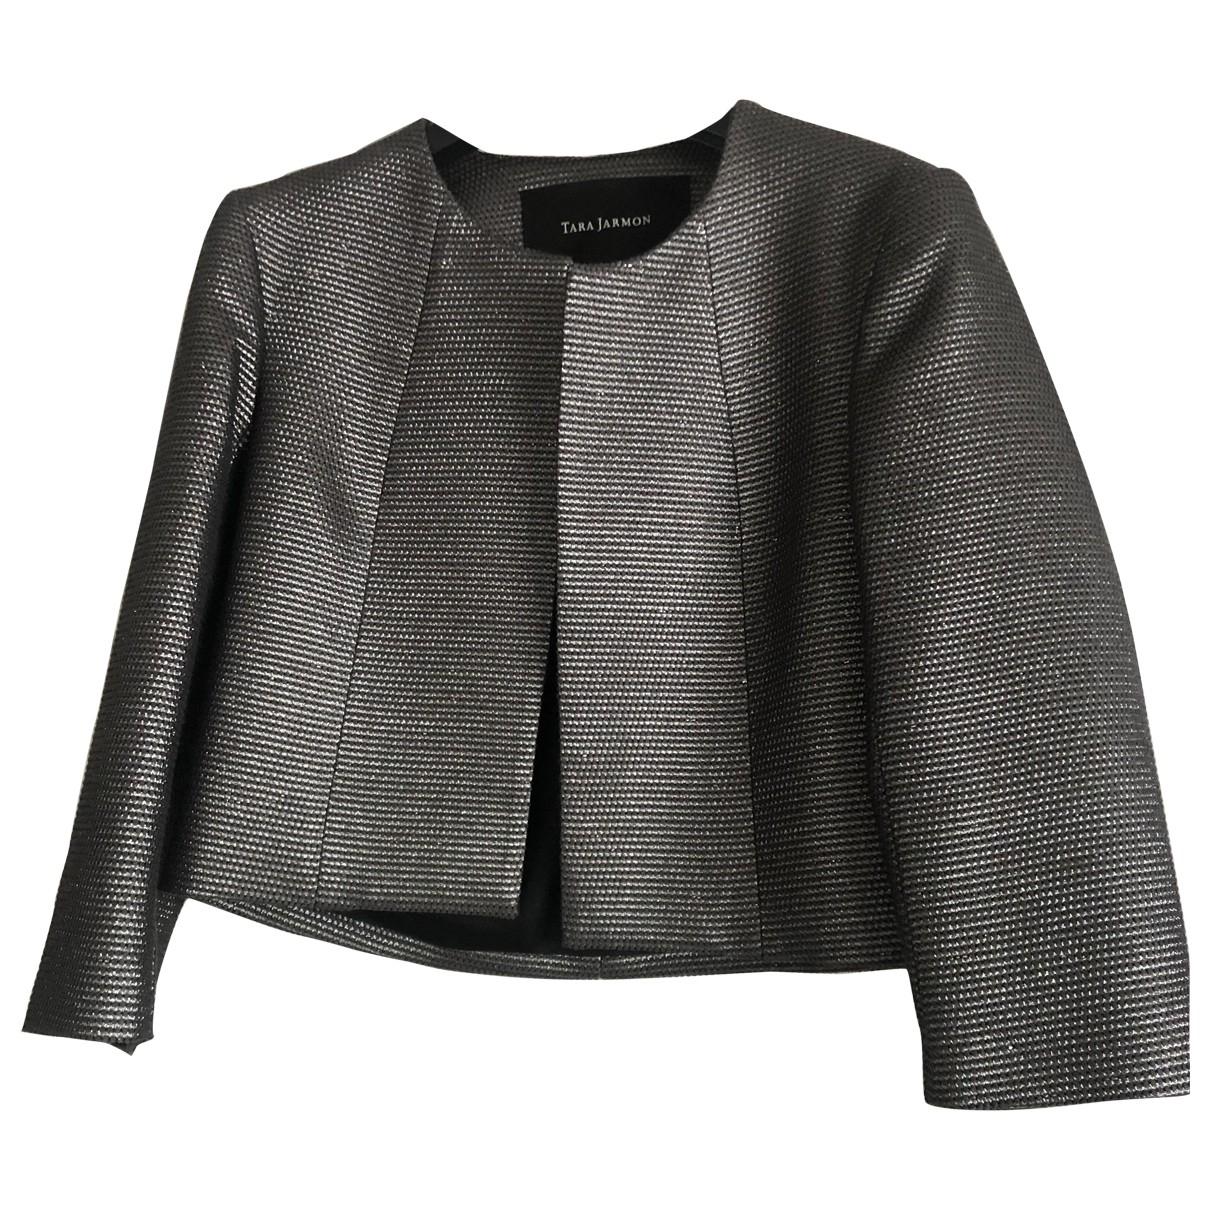 Tara Jarmon \N Silver Cotton jacket for Women 36 FR